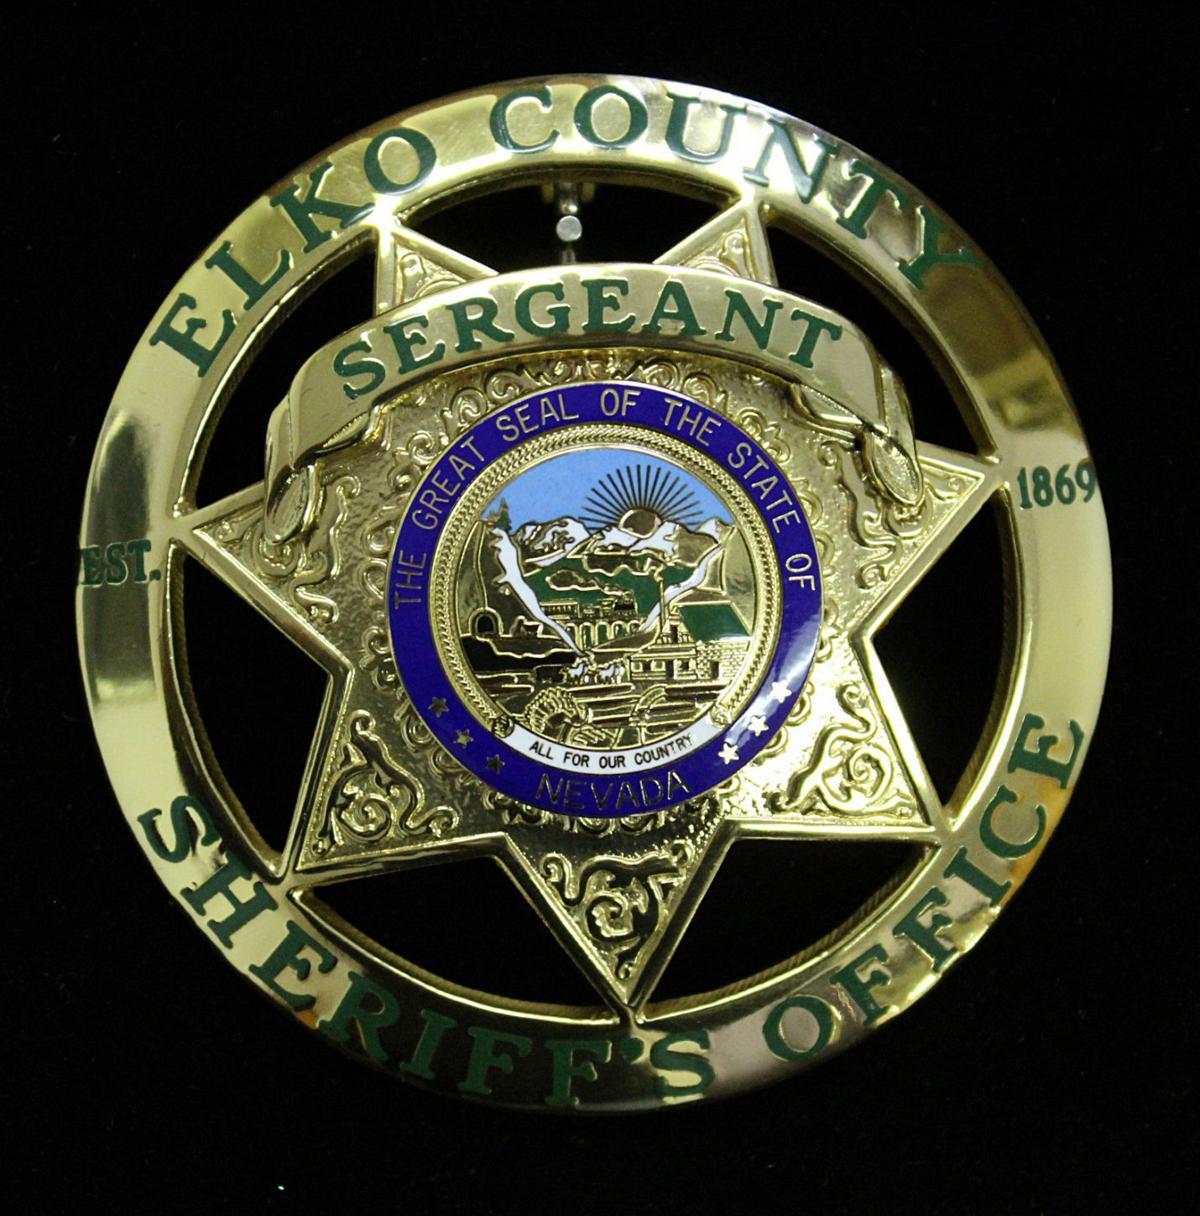 Elko County Sheriff's Badge